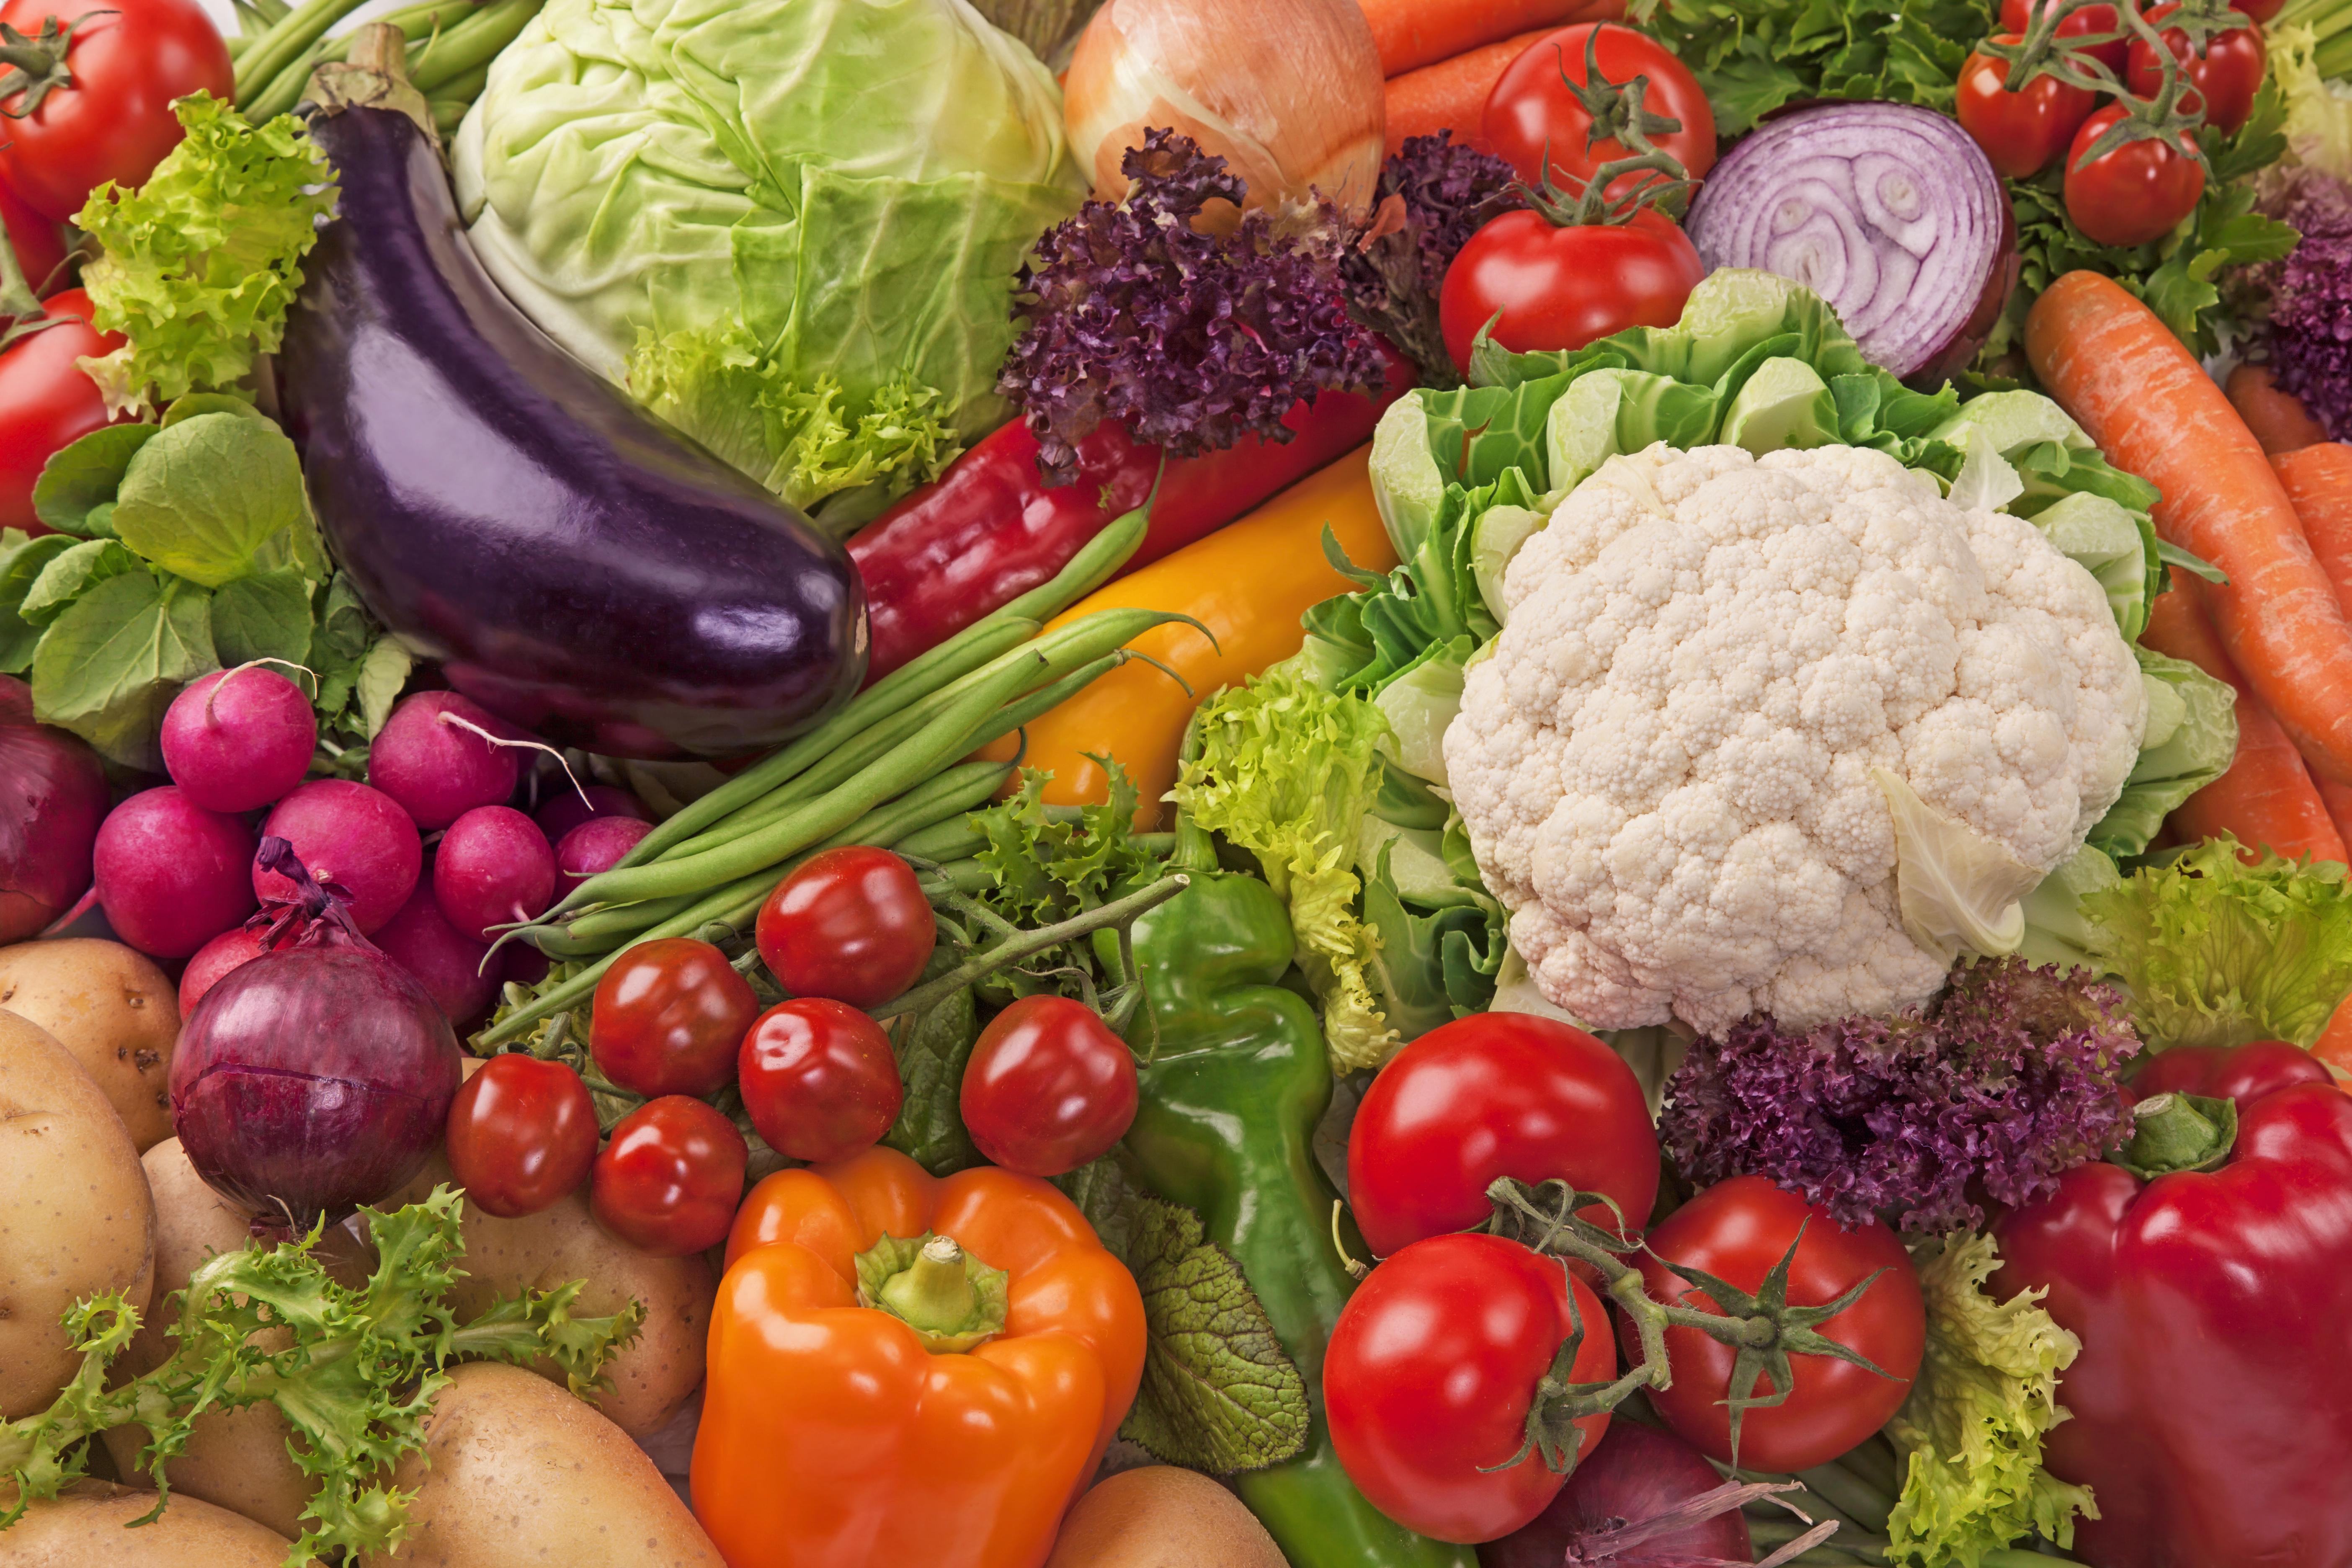 bigstock-Assortment-of-fresh-vegetables-54006397